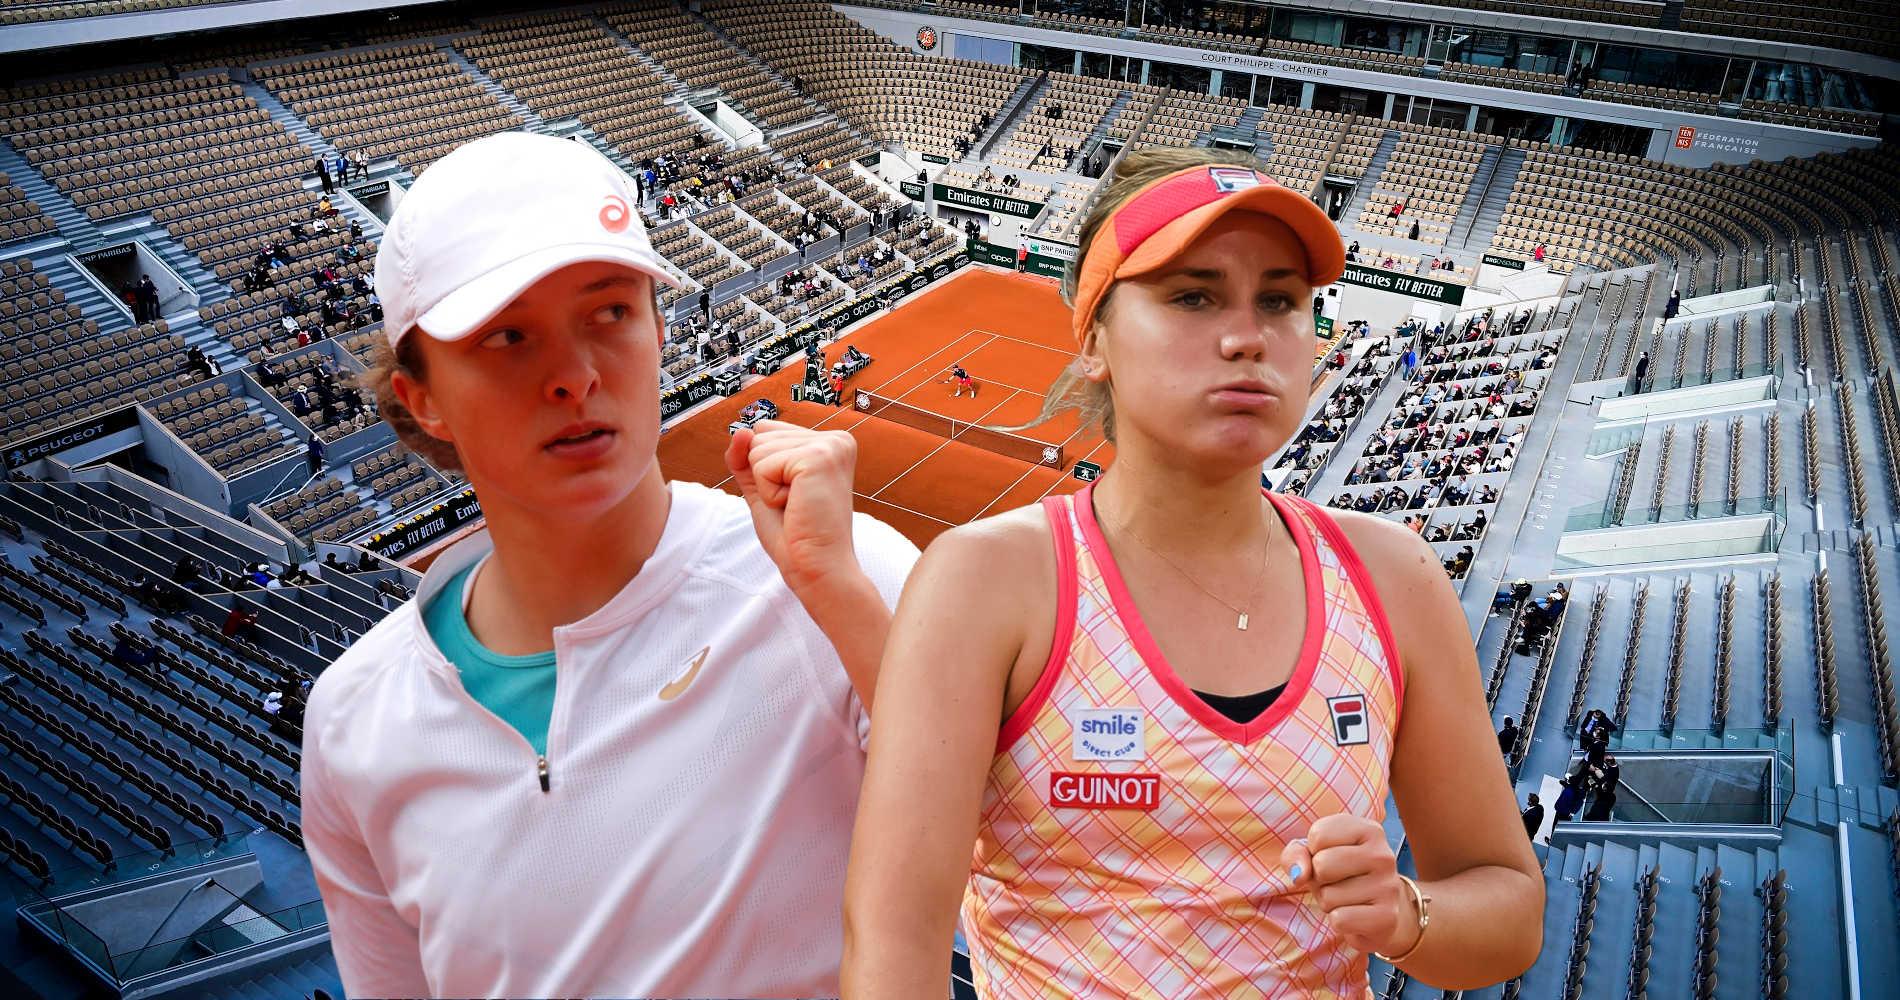 Iga Swiatek v Sofia Kenin, 2020 Roland-Garros Women's Final